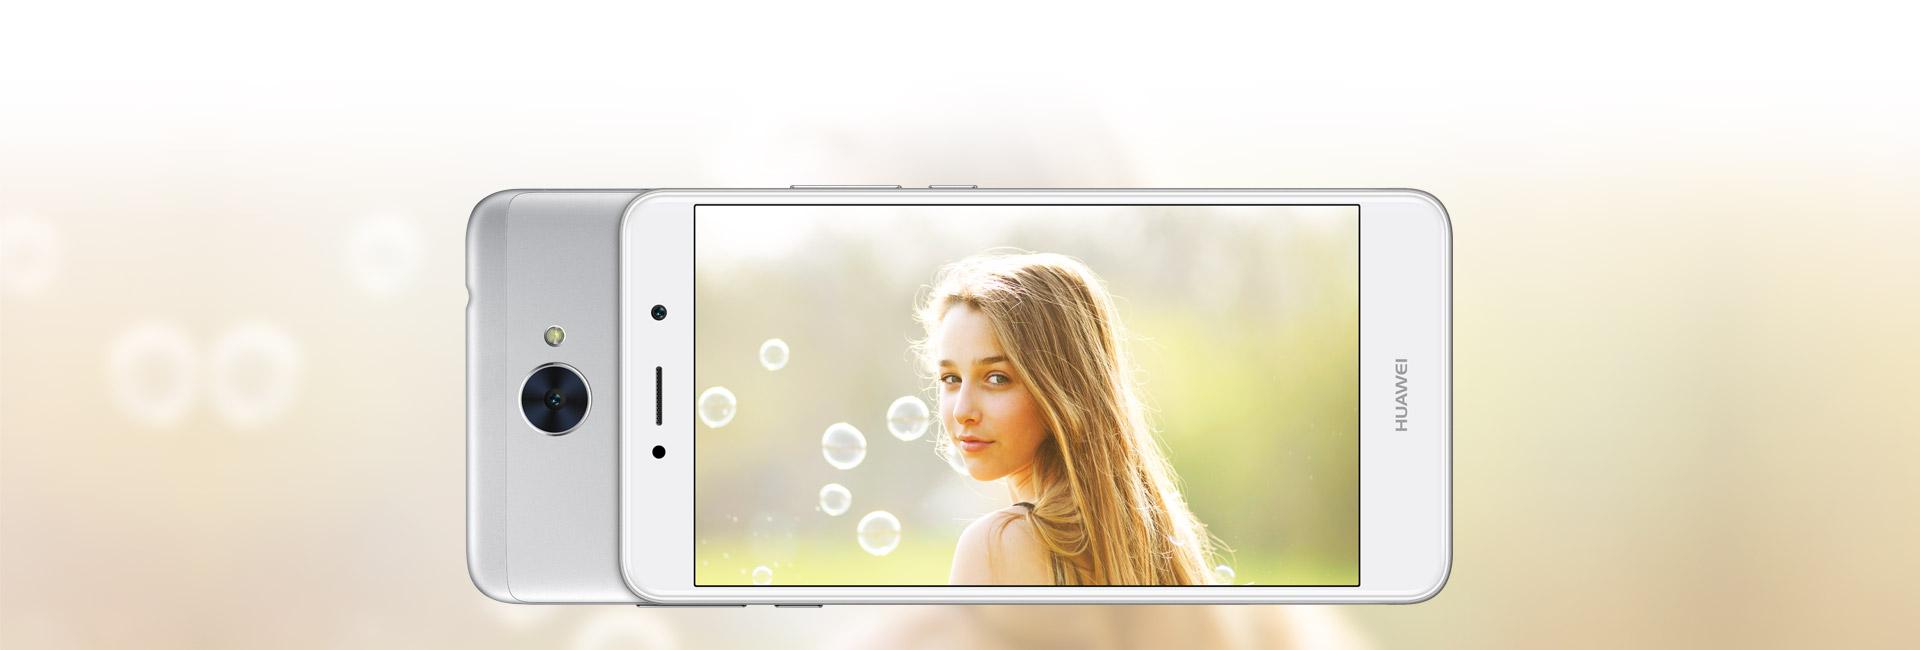 Y7 PRIMEقیمت موبایل 5.5 اینچی هوآوی مدل